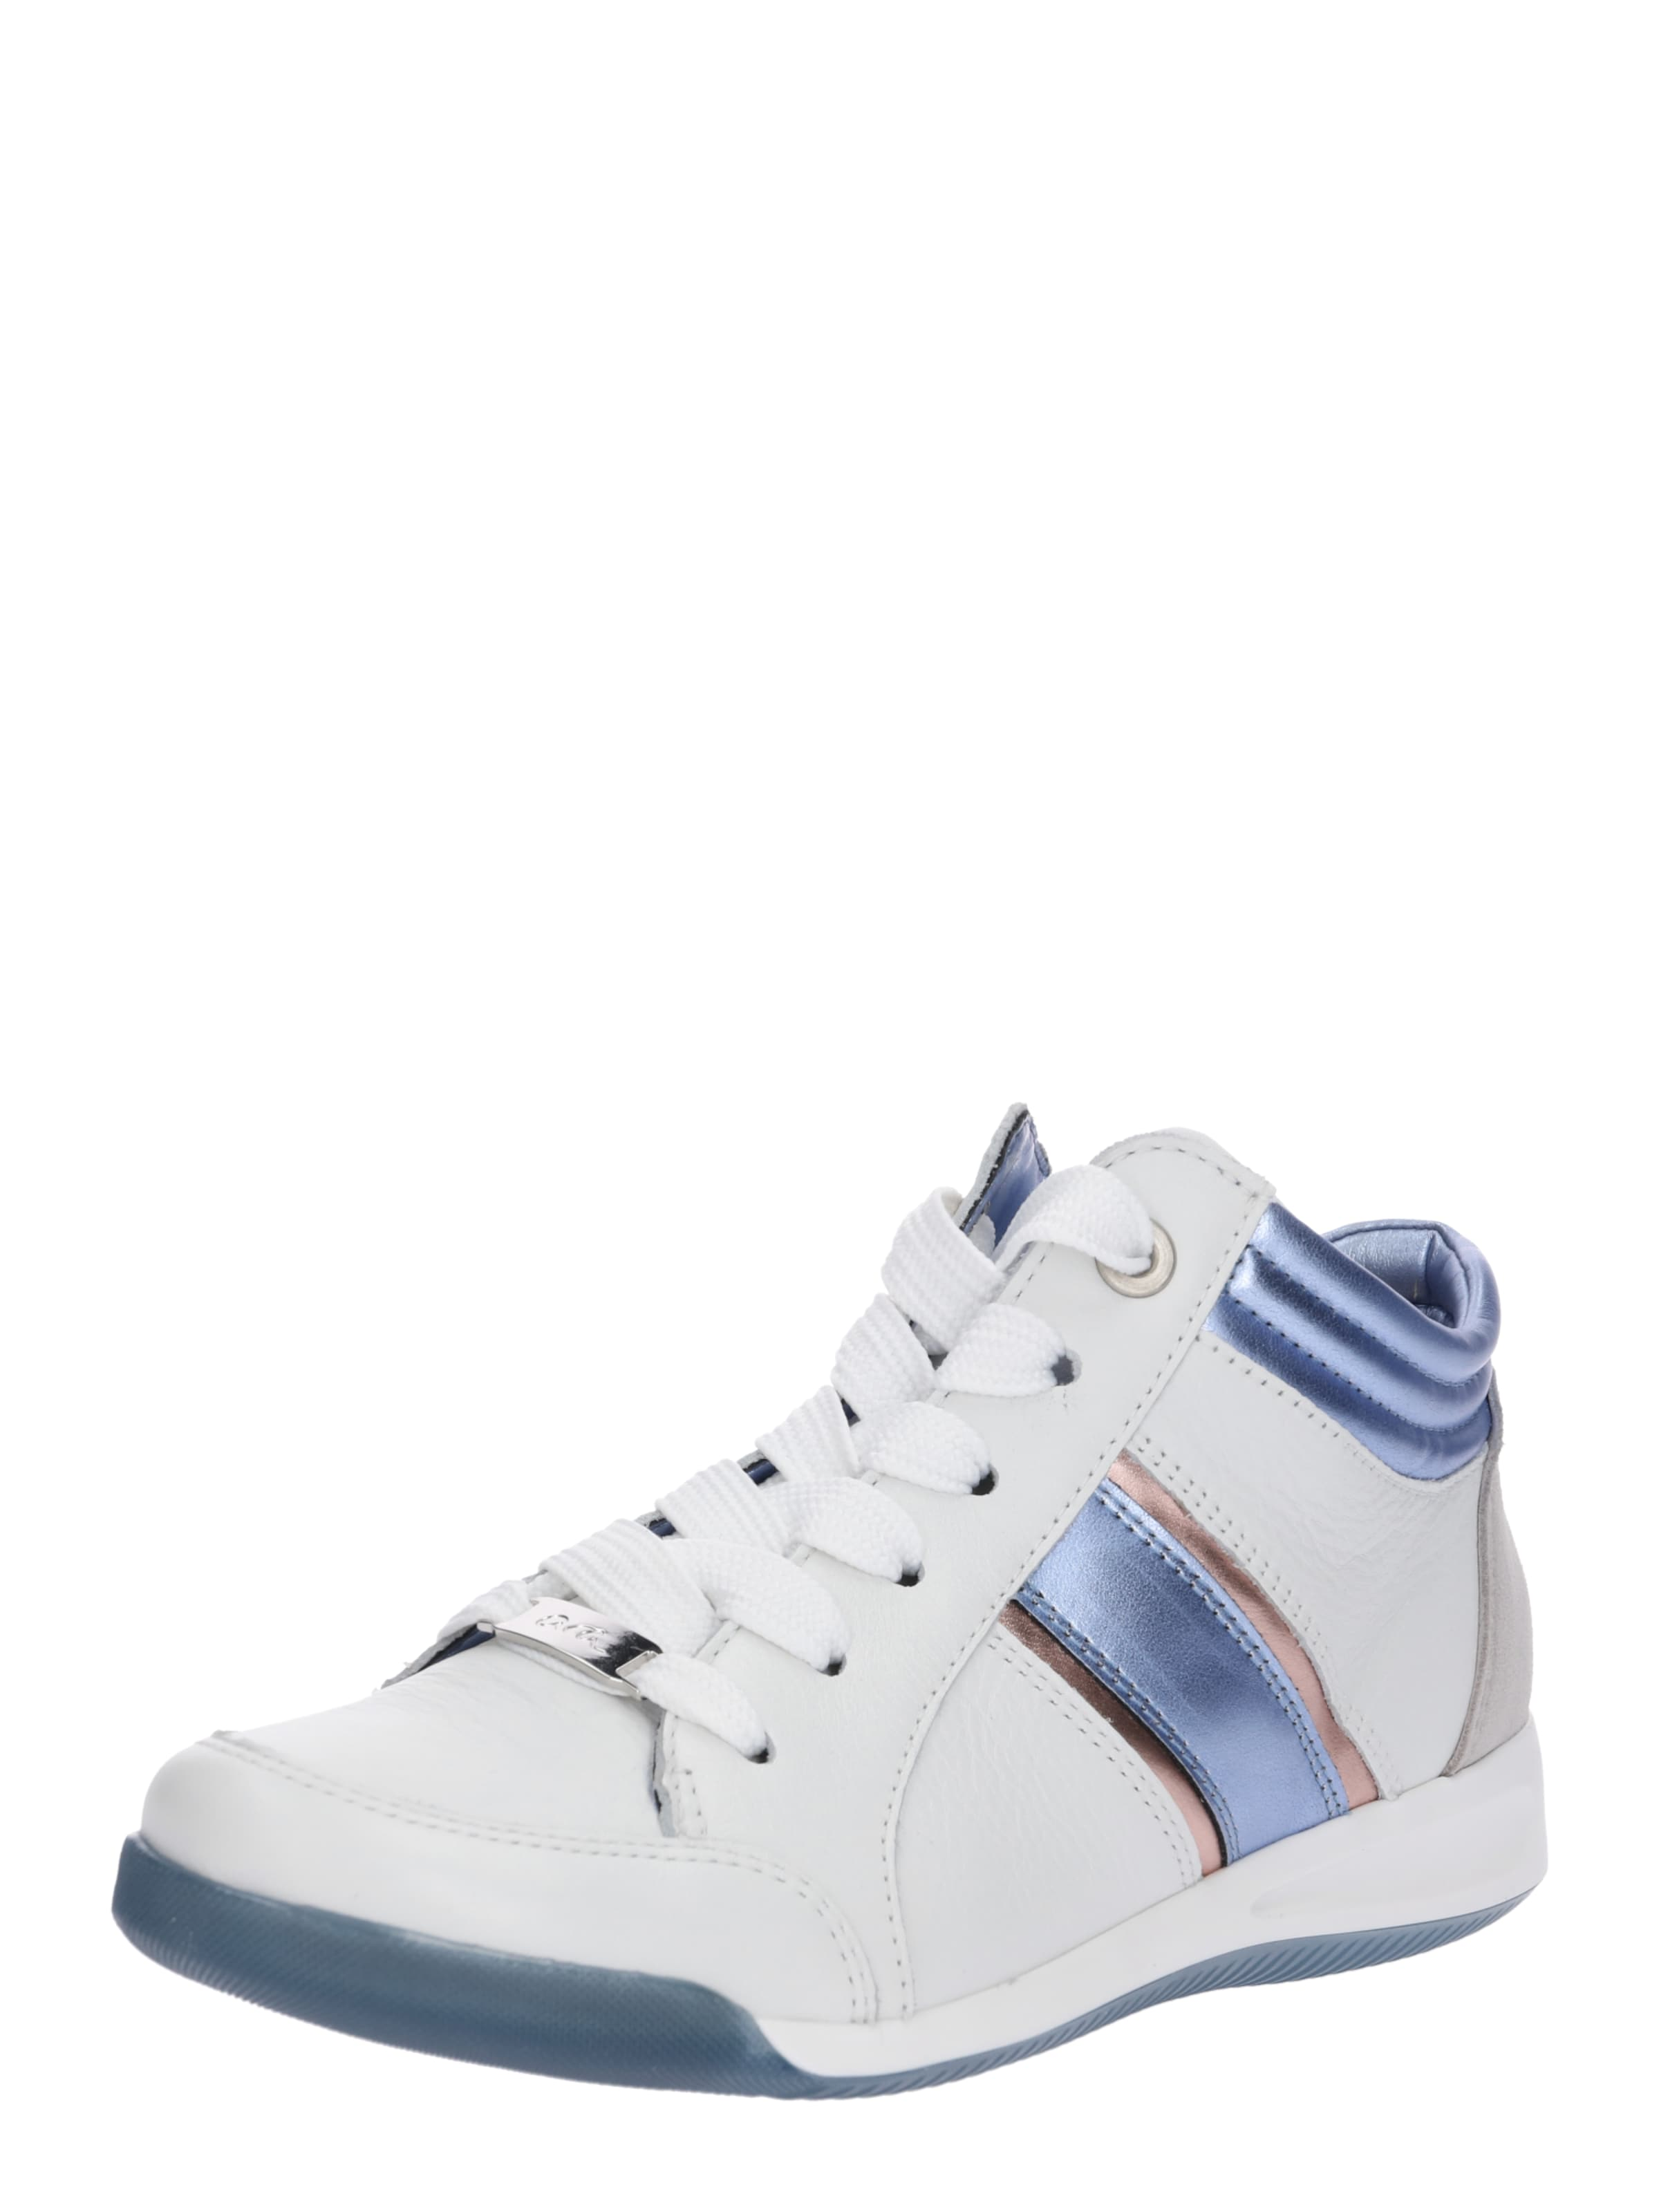 Hautes Bleu Baskets 'rom stf' Ara En CielBlanc ZuTOPiwkXl